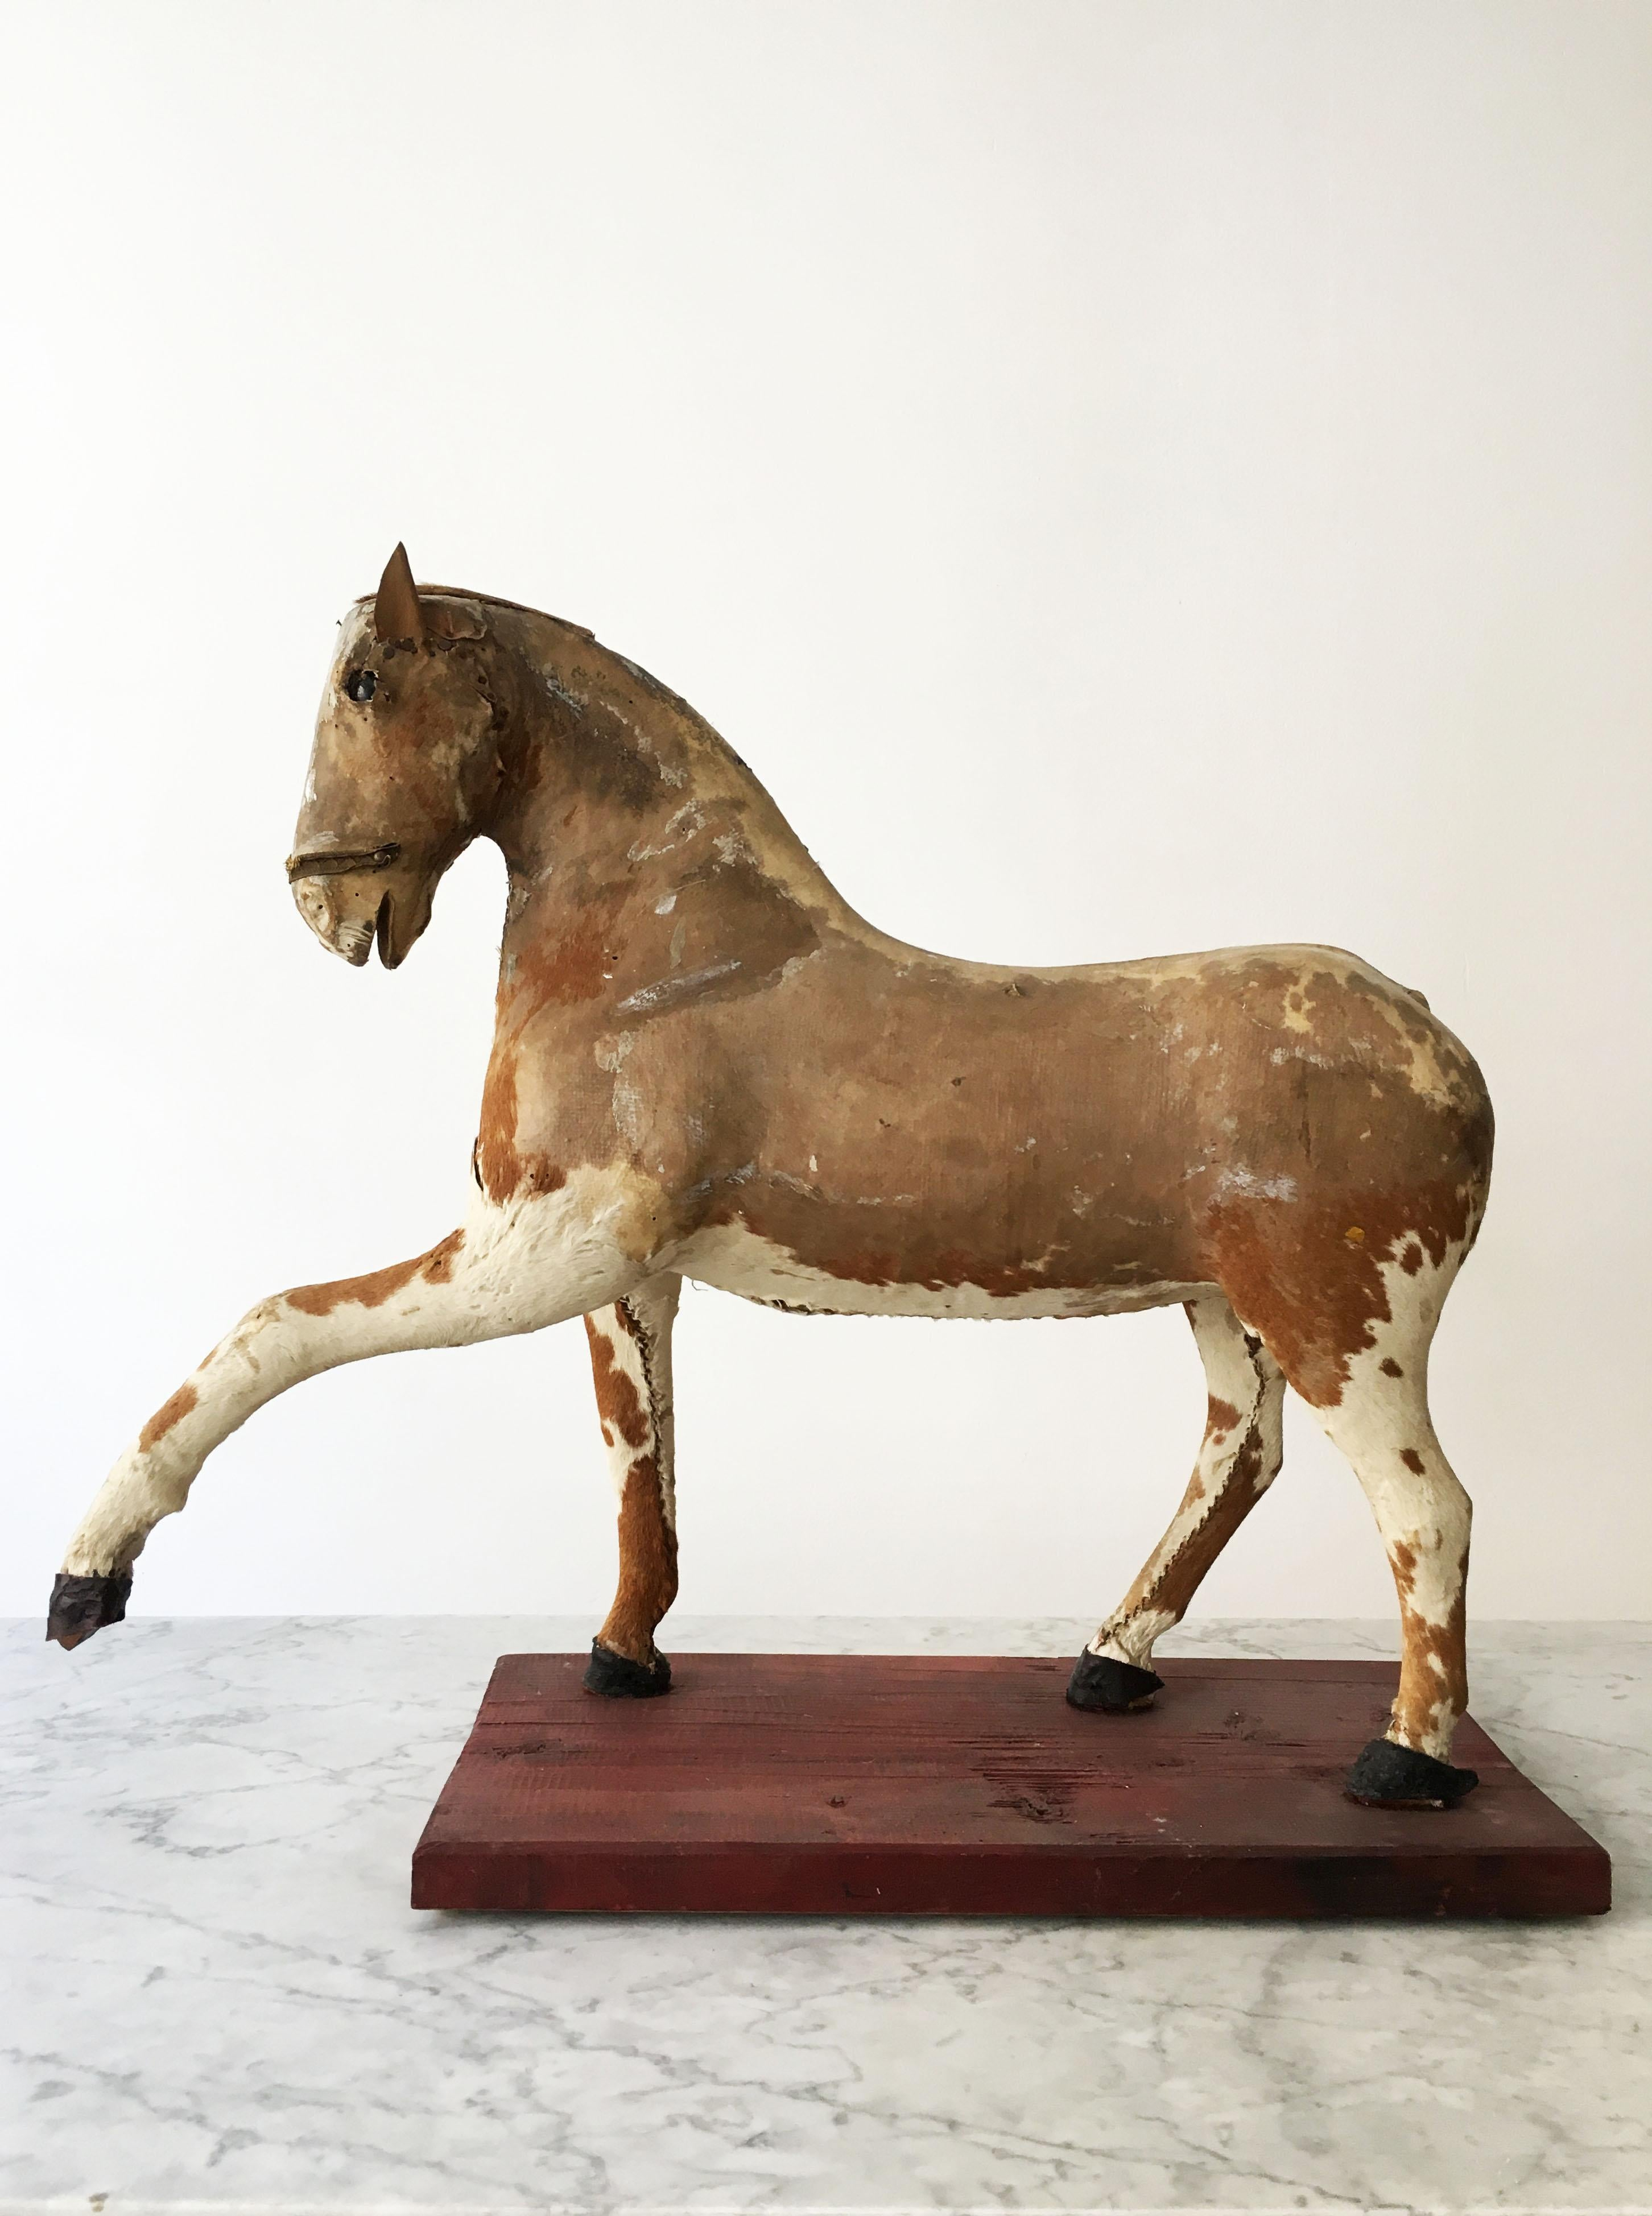 Primitive Modern Horse Sculpture Historical Toy Austria 1920s For Sale At 1stdibs